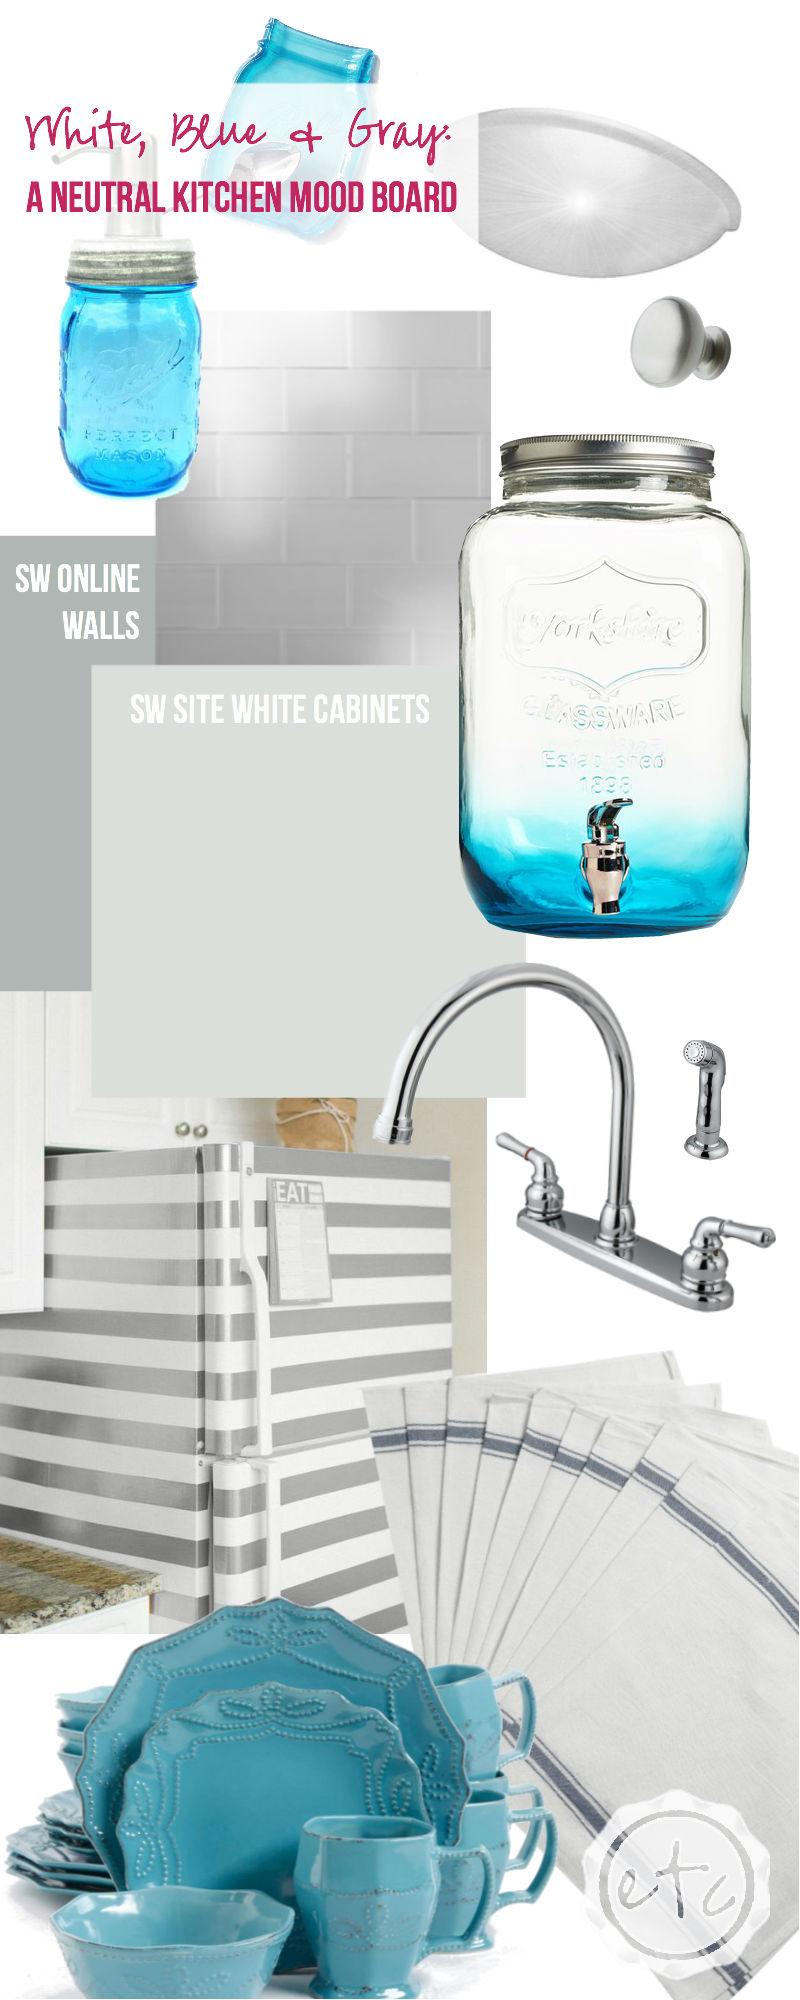 White, Blue & Gray: a Neutral Kitchen Mood Board